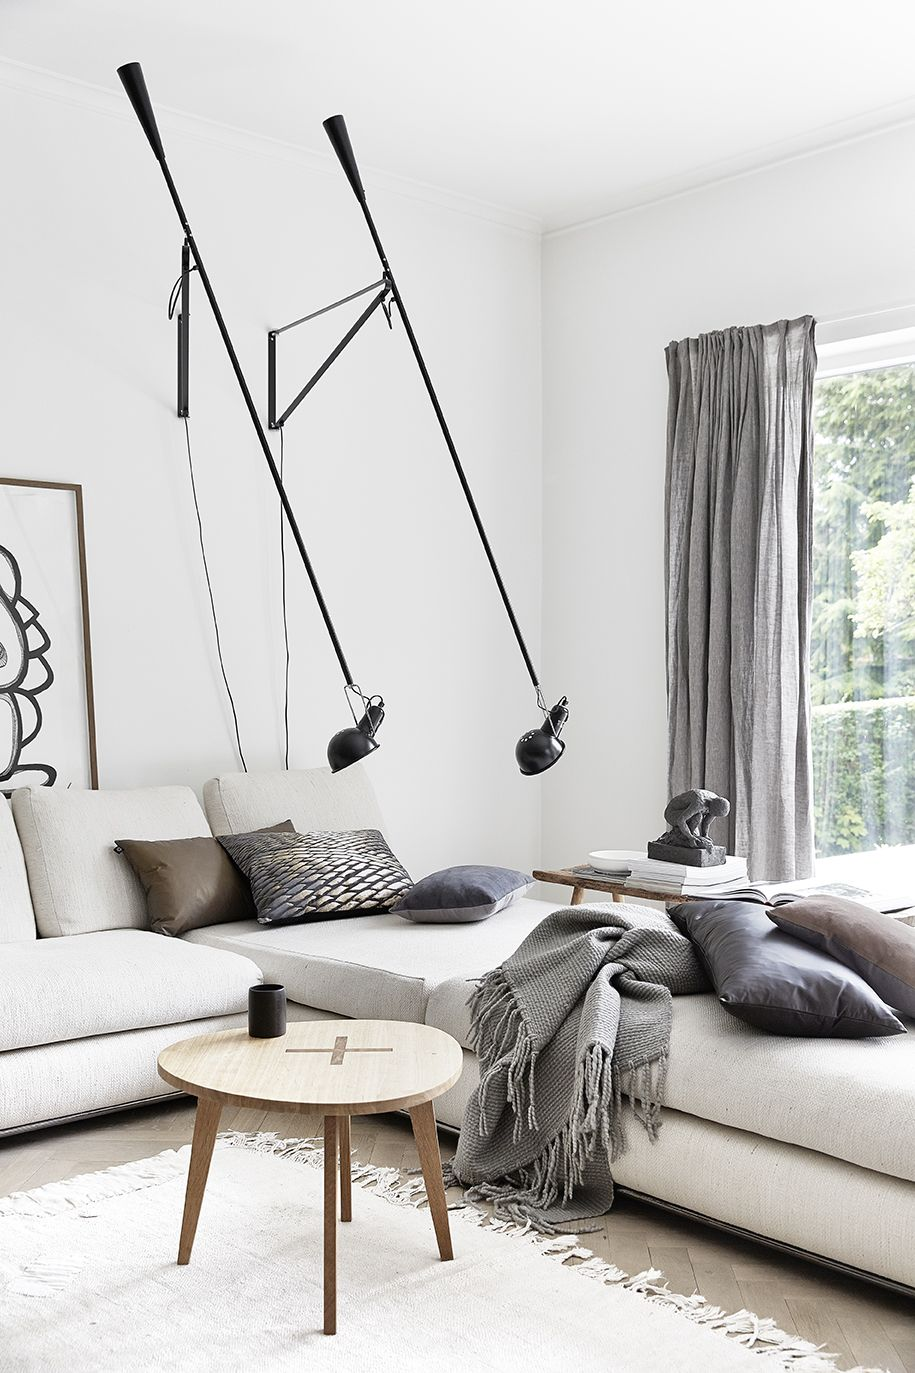 L mparas de pared iluminaci n hogar decoraci n hogar - Lamparas de interiores ...